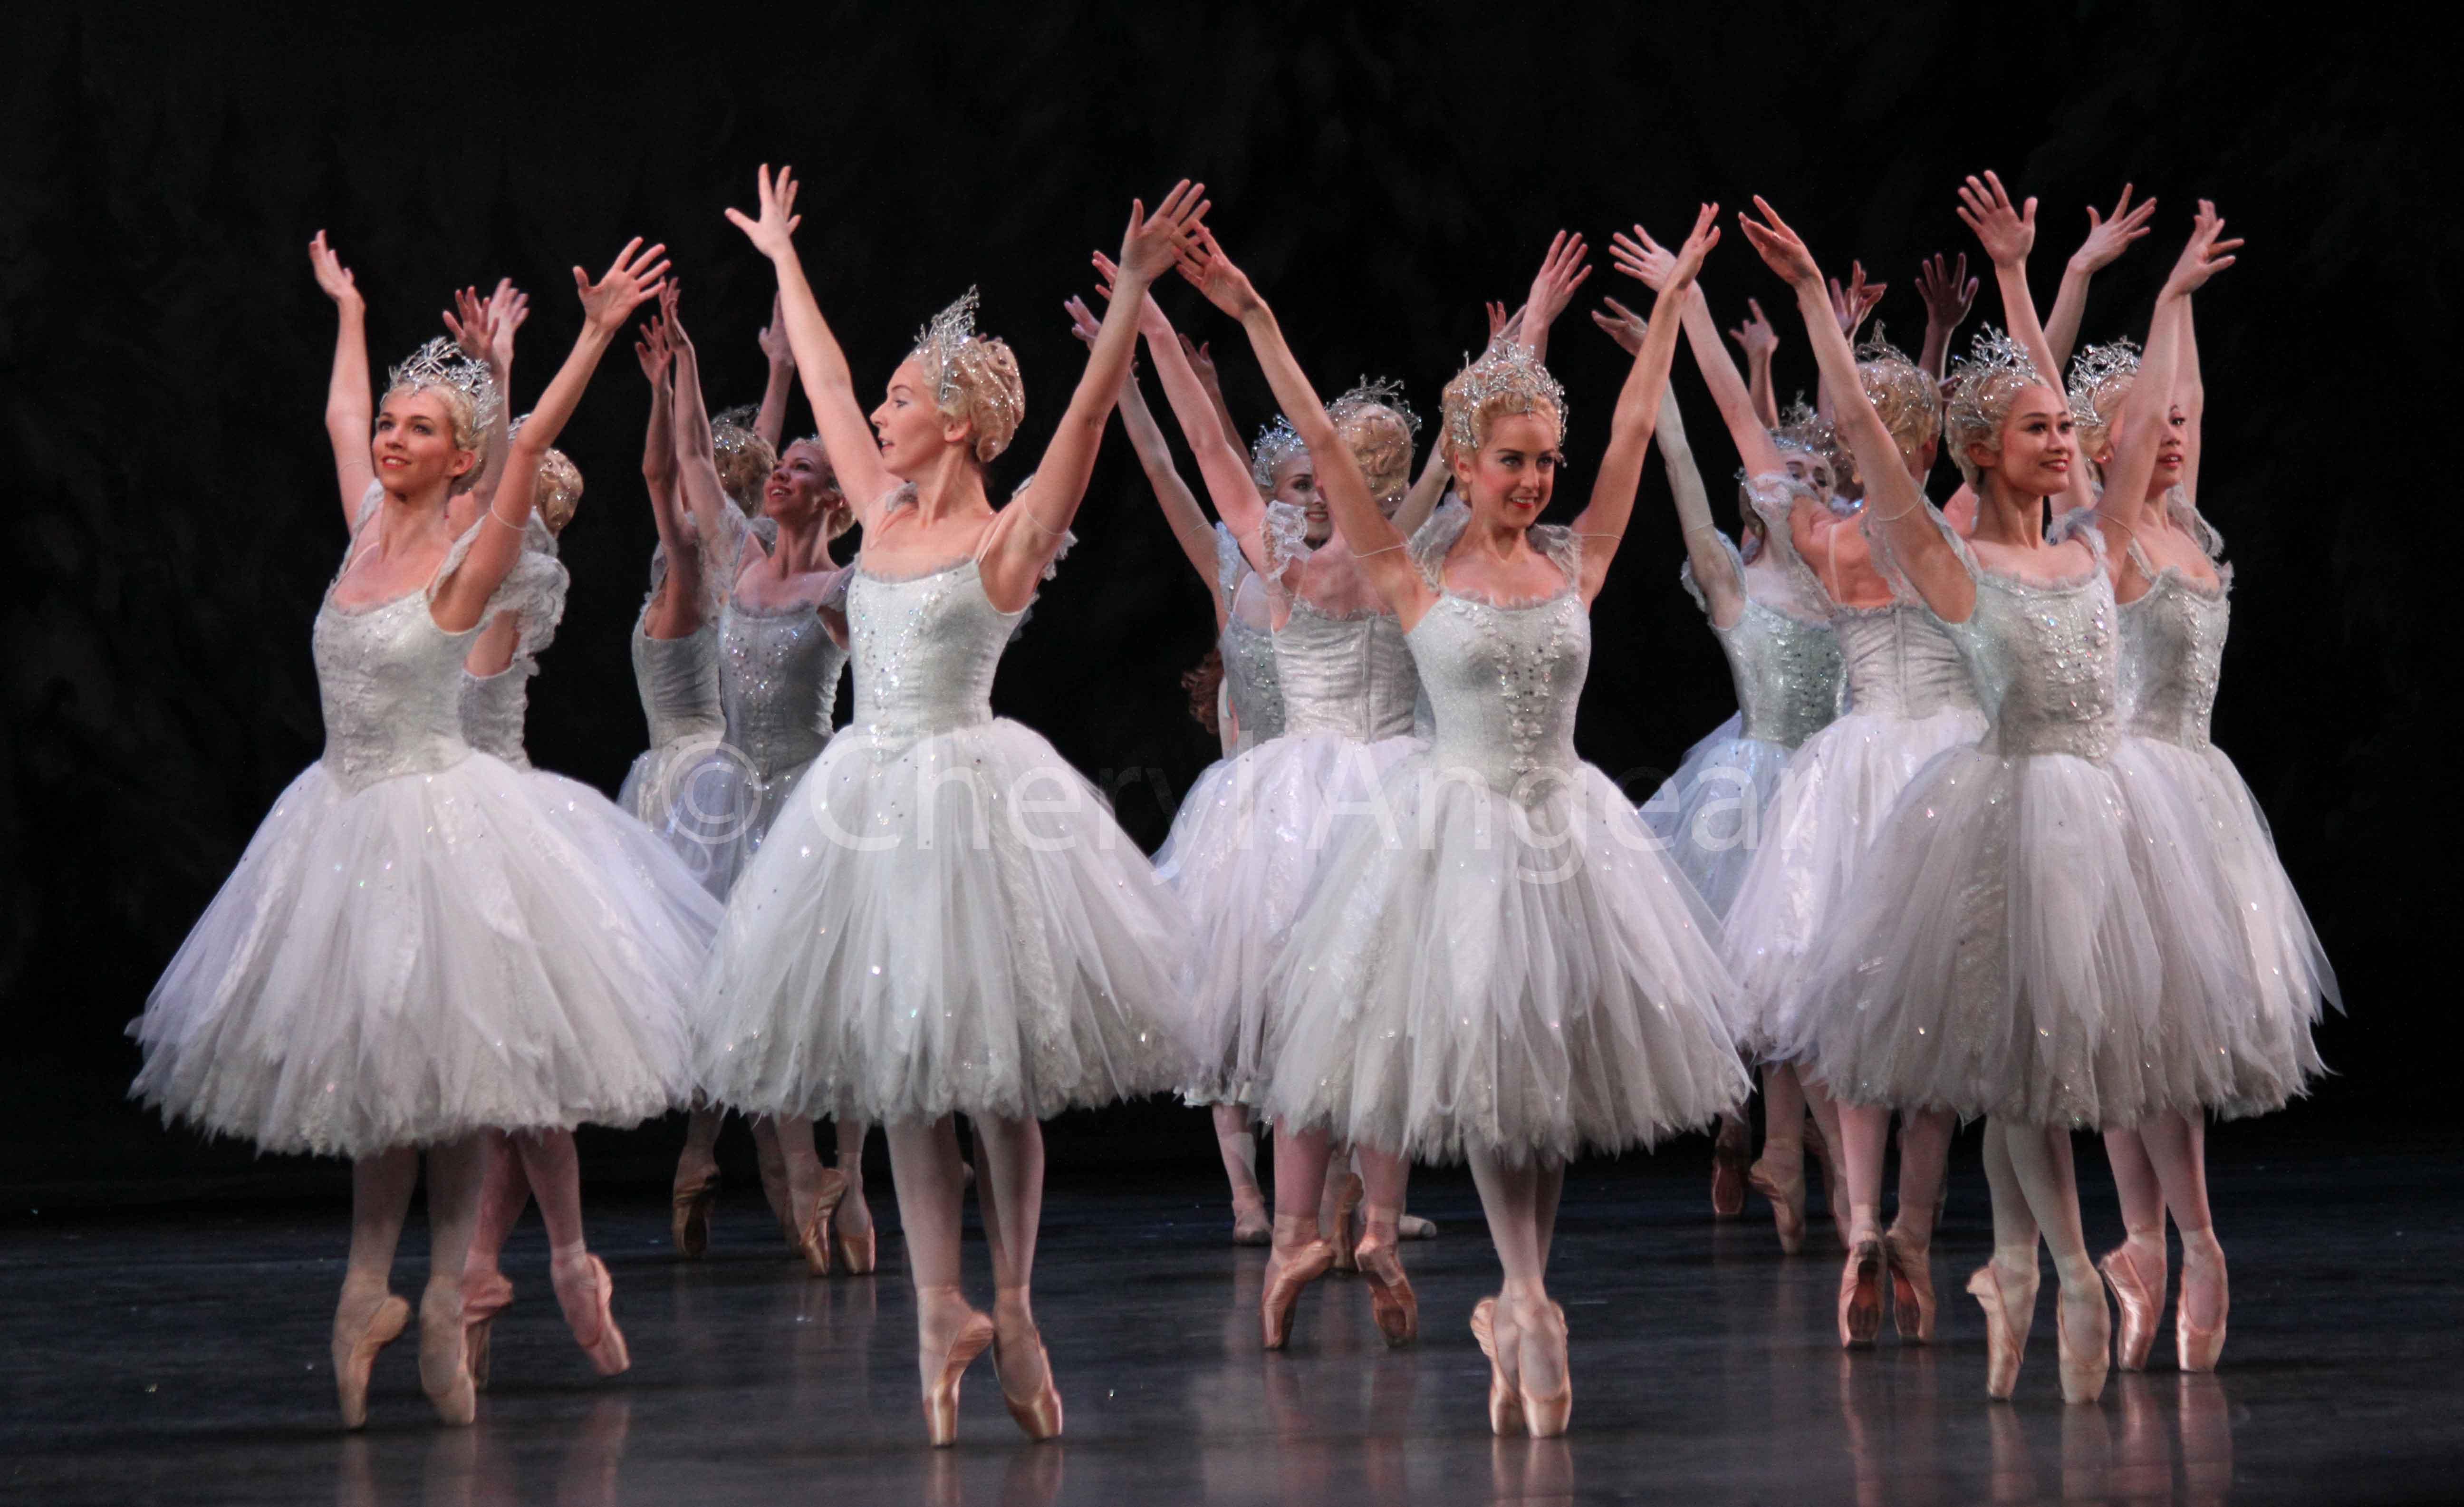 ballet dancers on pointe dressed as snowflakes